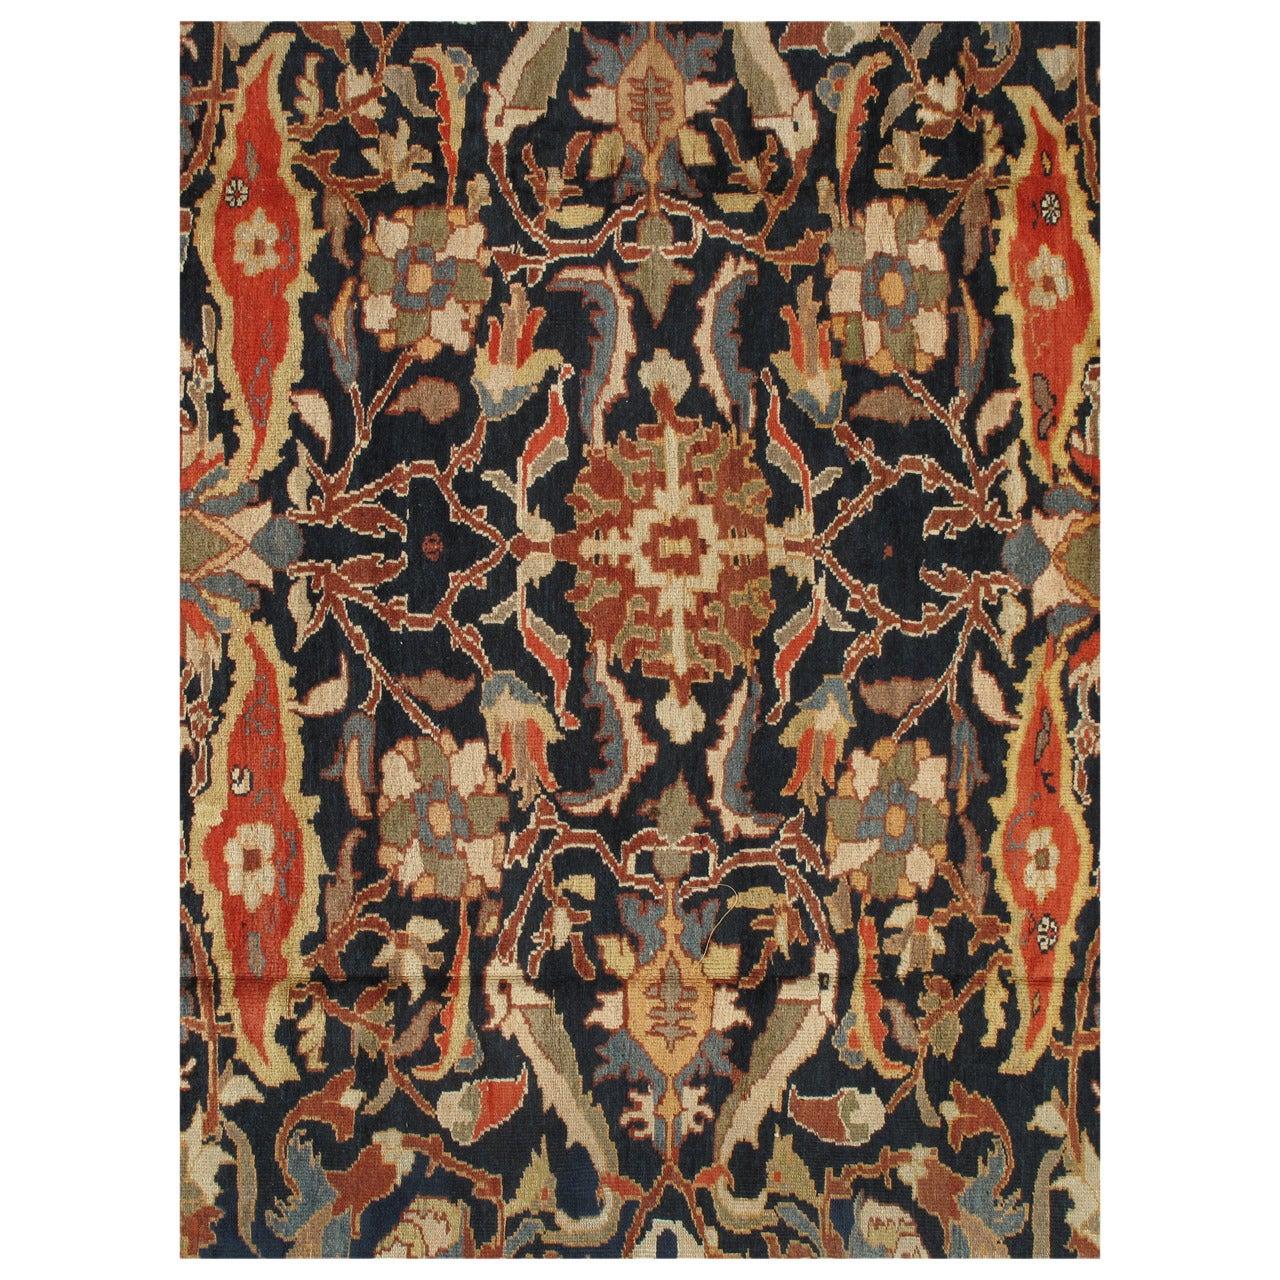 Antique Persian Sultanabad Carpet, Handmade Oriental Rug, Navy Blue, Rust, Gold